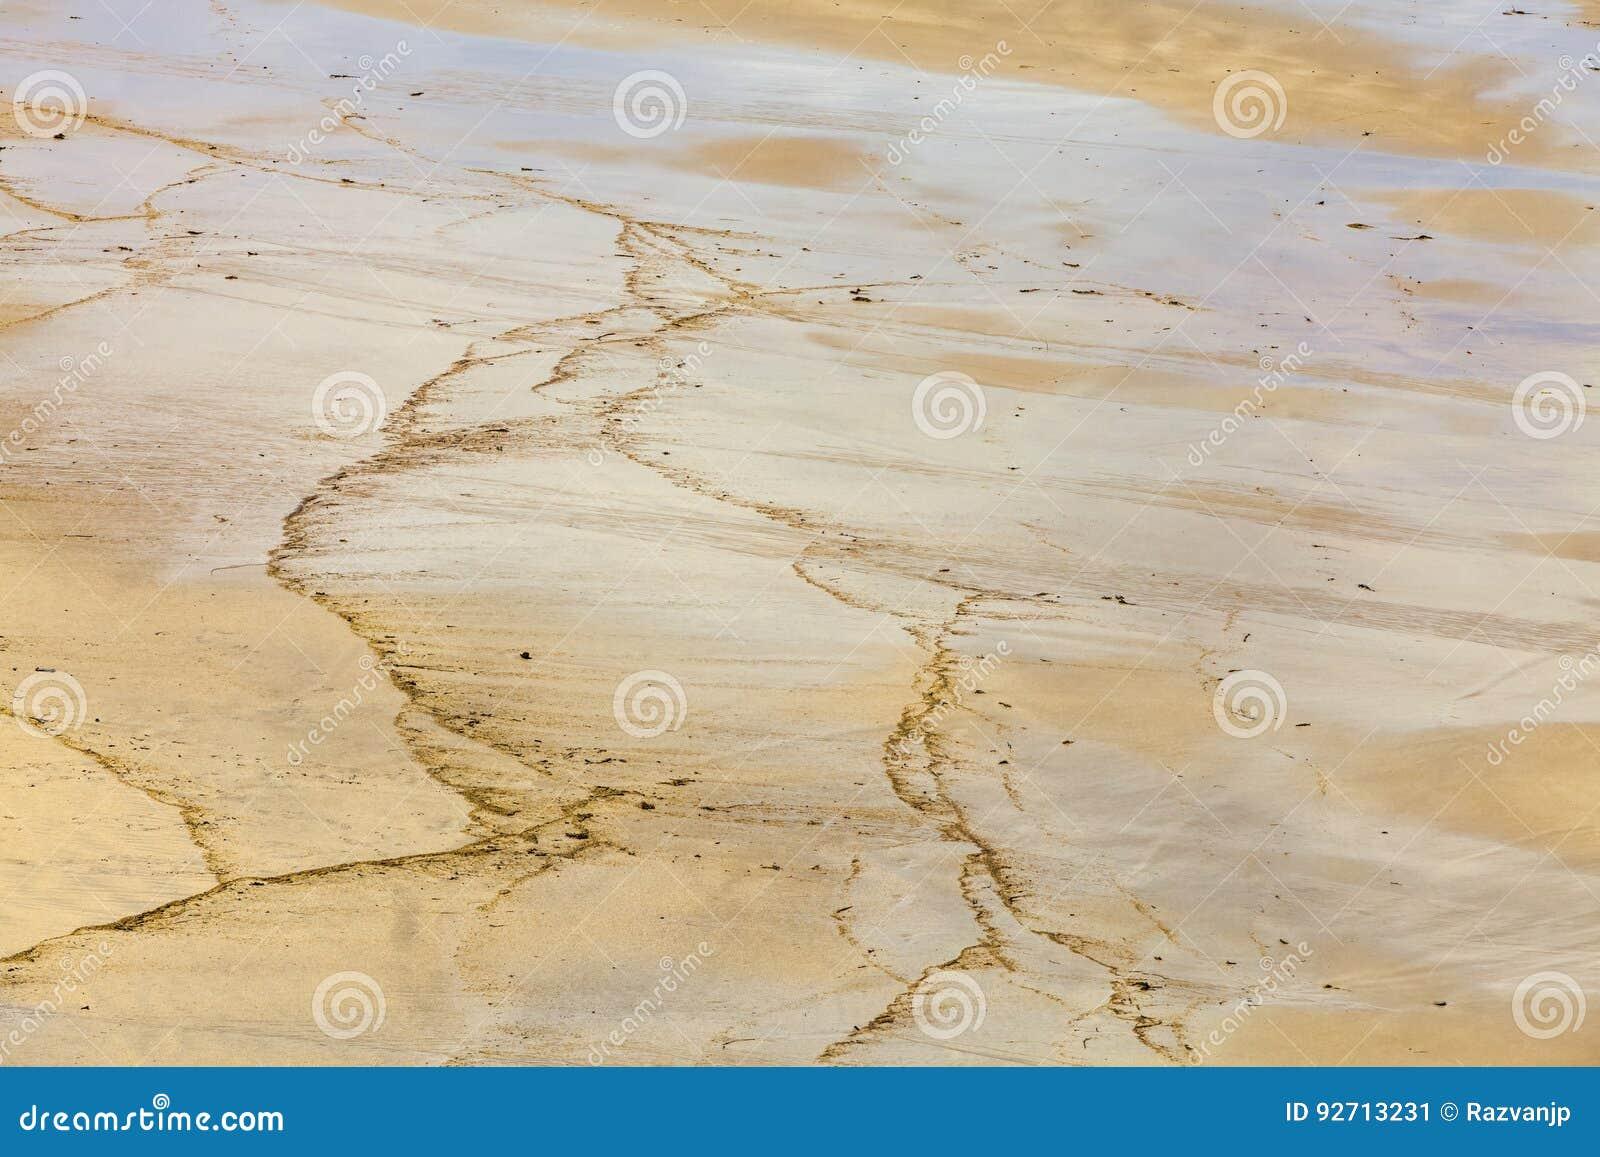 Detalle de la arena